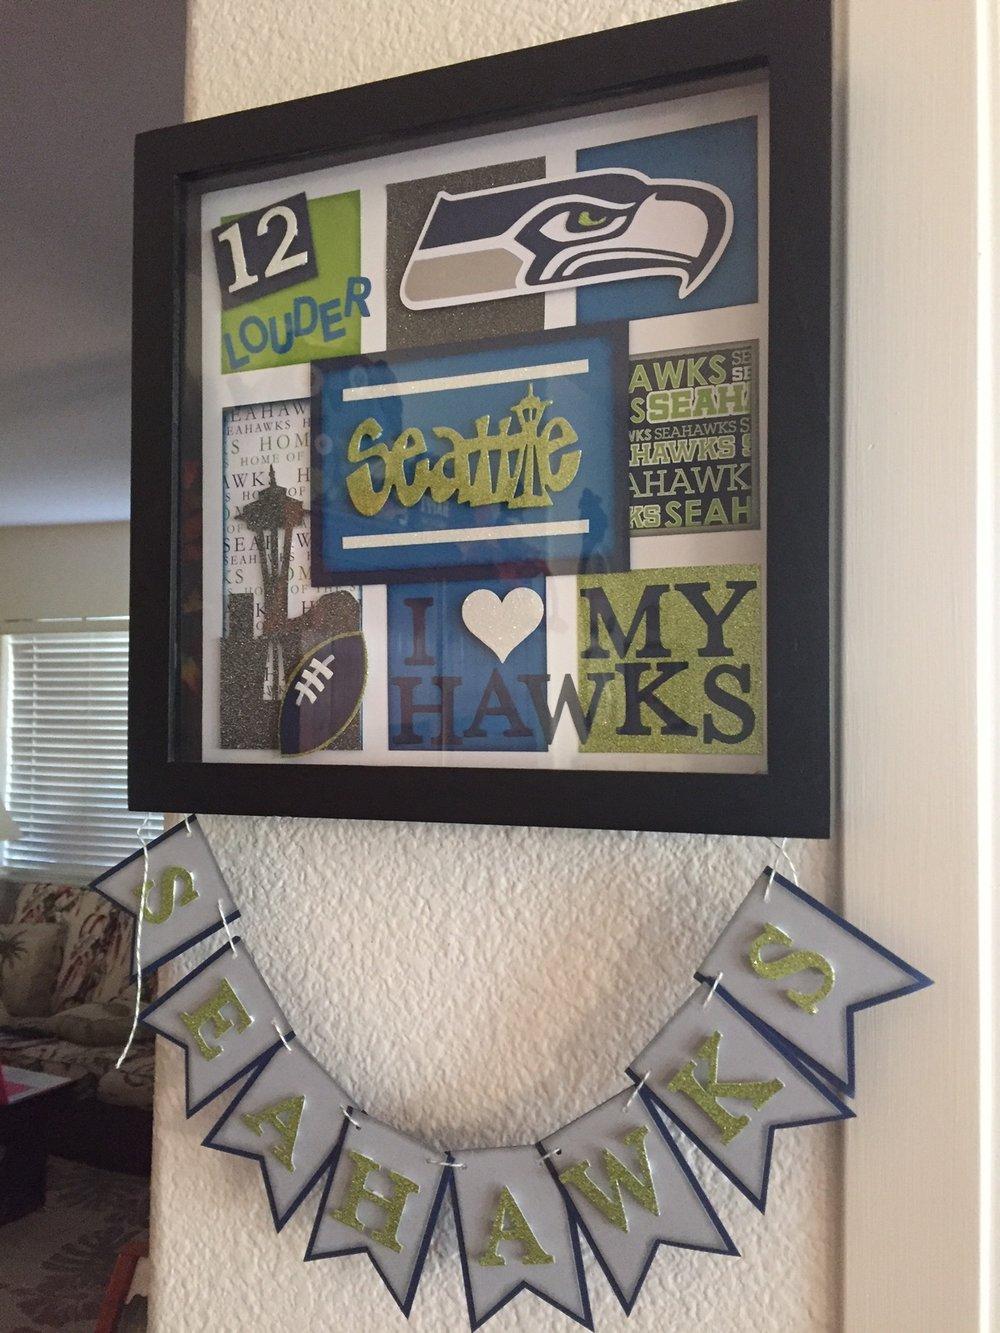 Seahawks gift from Jennifer - www.stampedwithaloha.com